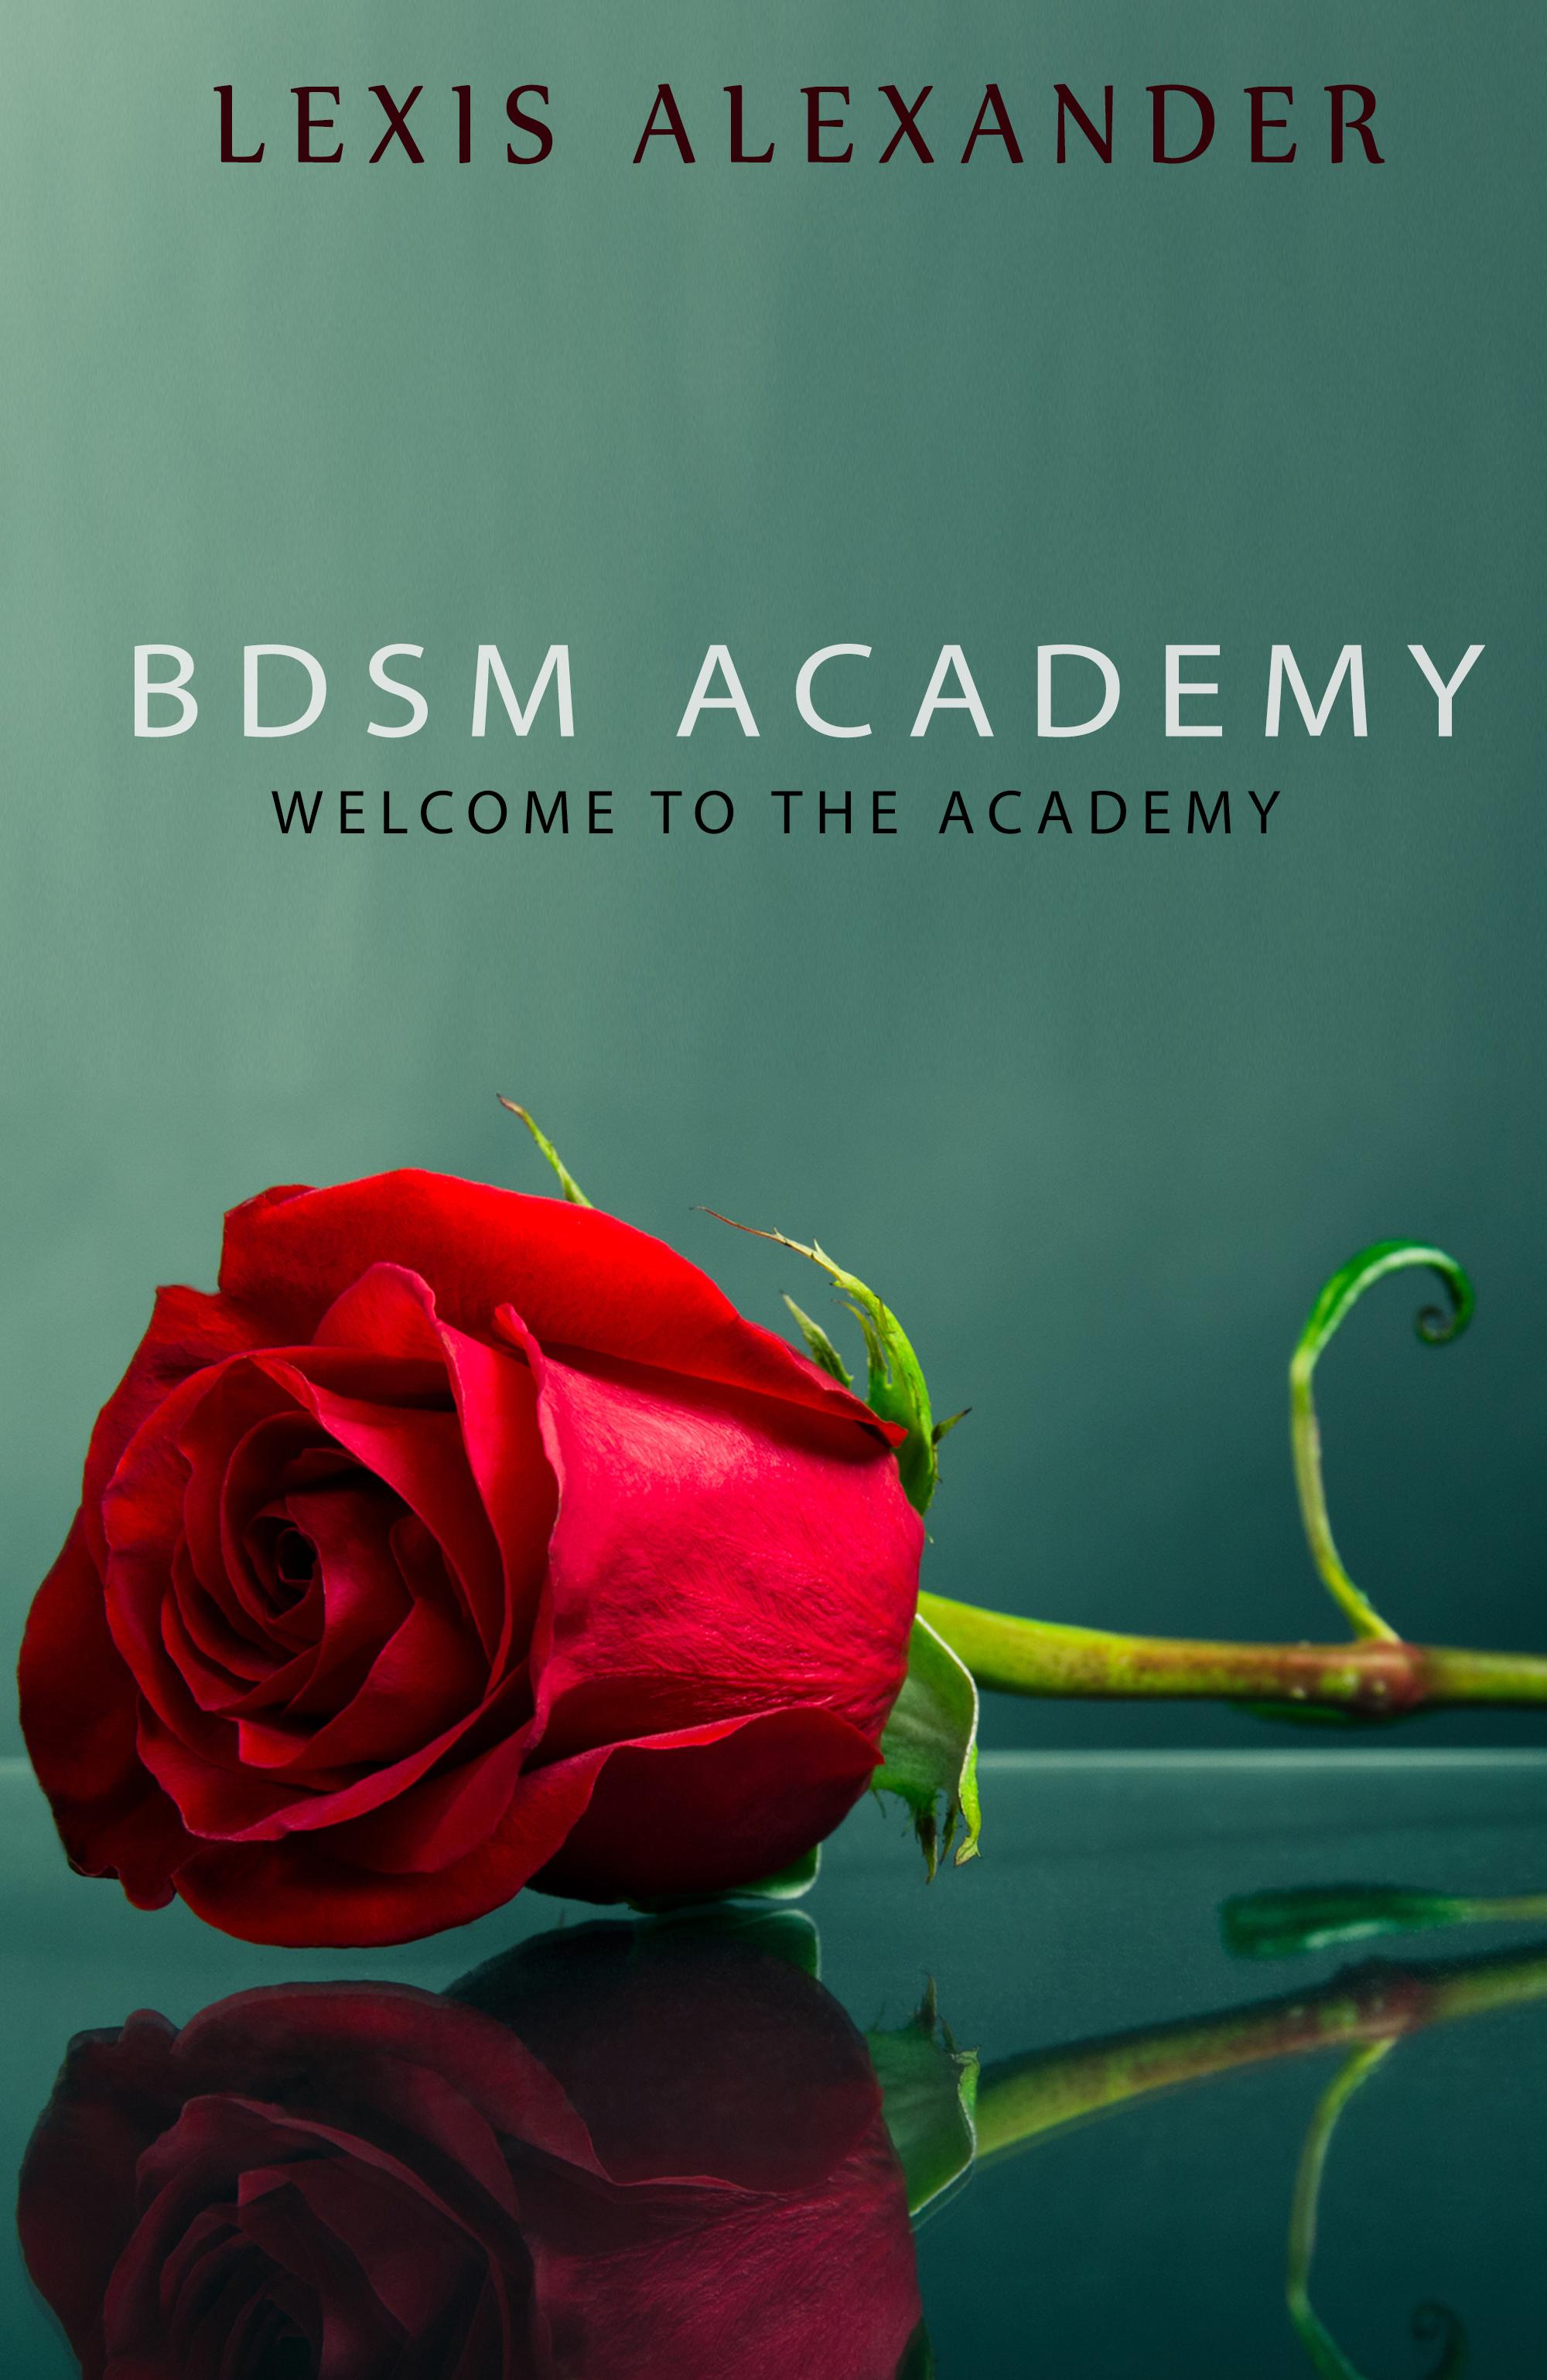 BDSM Academy